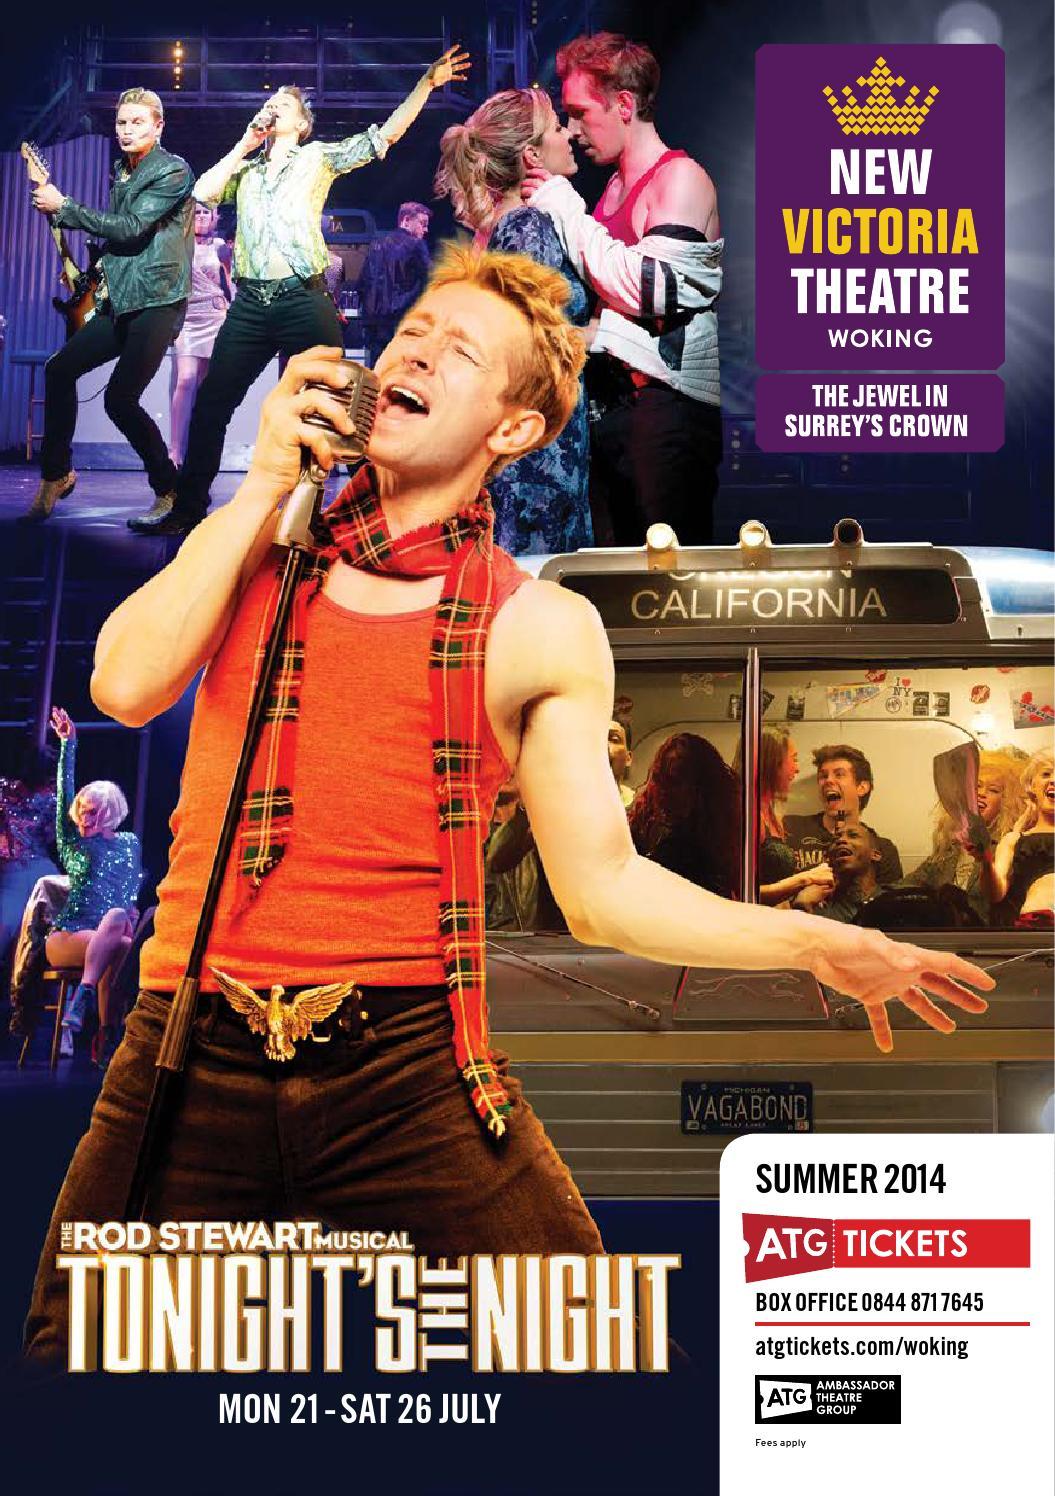 06acfcd02b5f6 New Victoria Theatre Woking Summer 2014 Brochure by ATG Tickets - issuu